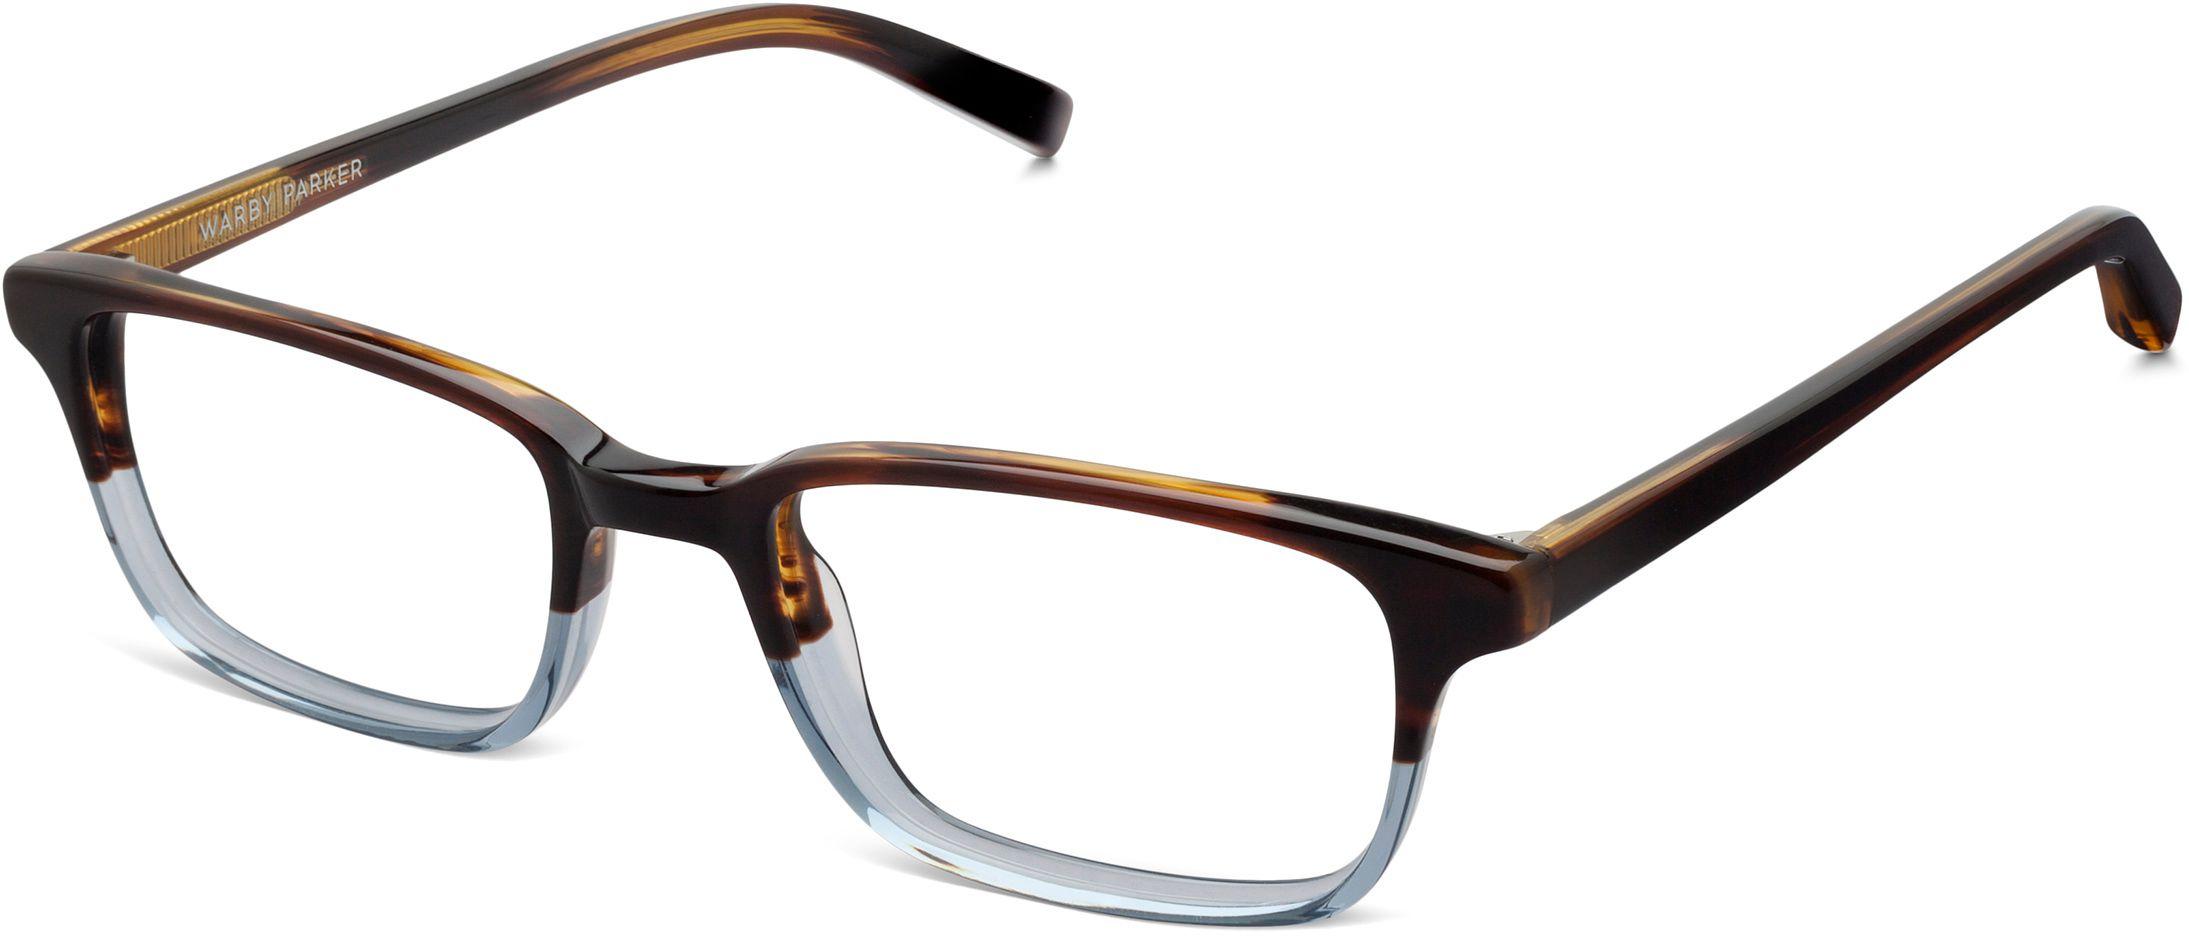 5e9a85a44e97 Wilkie Eyeglasses in Eastern Bluebird Fade for Men